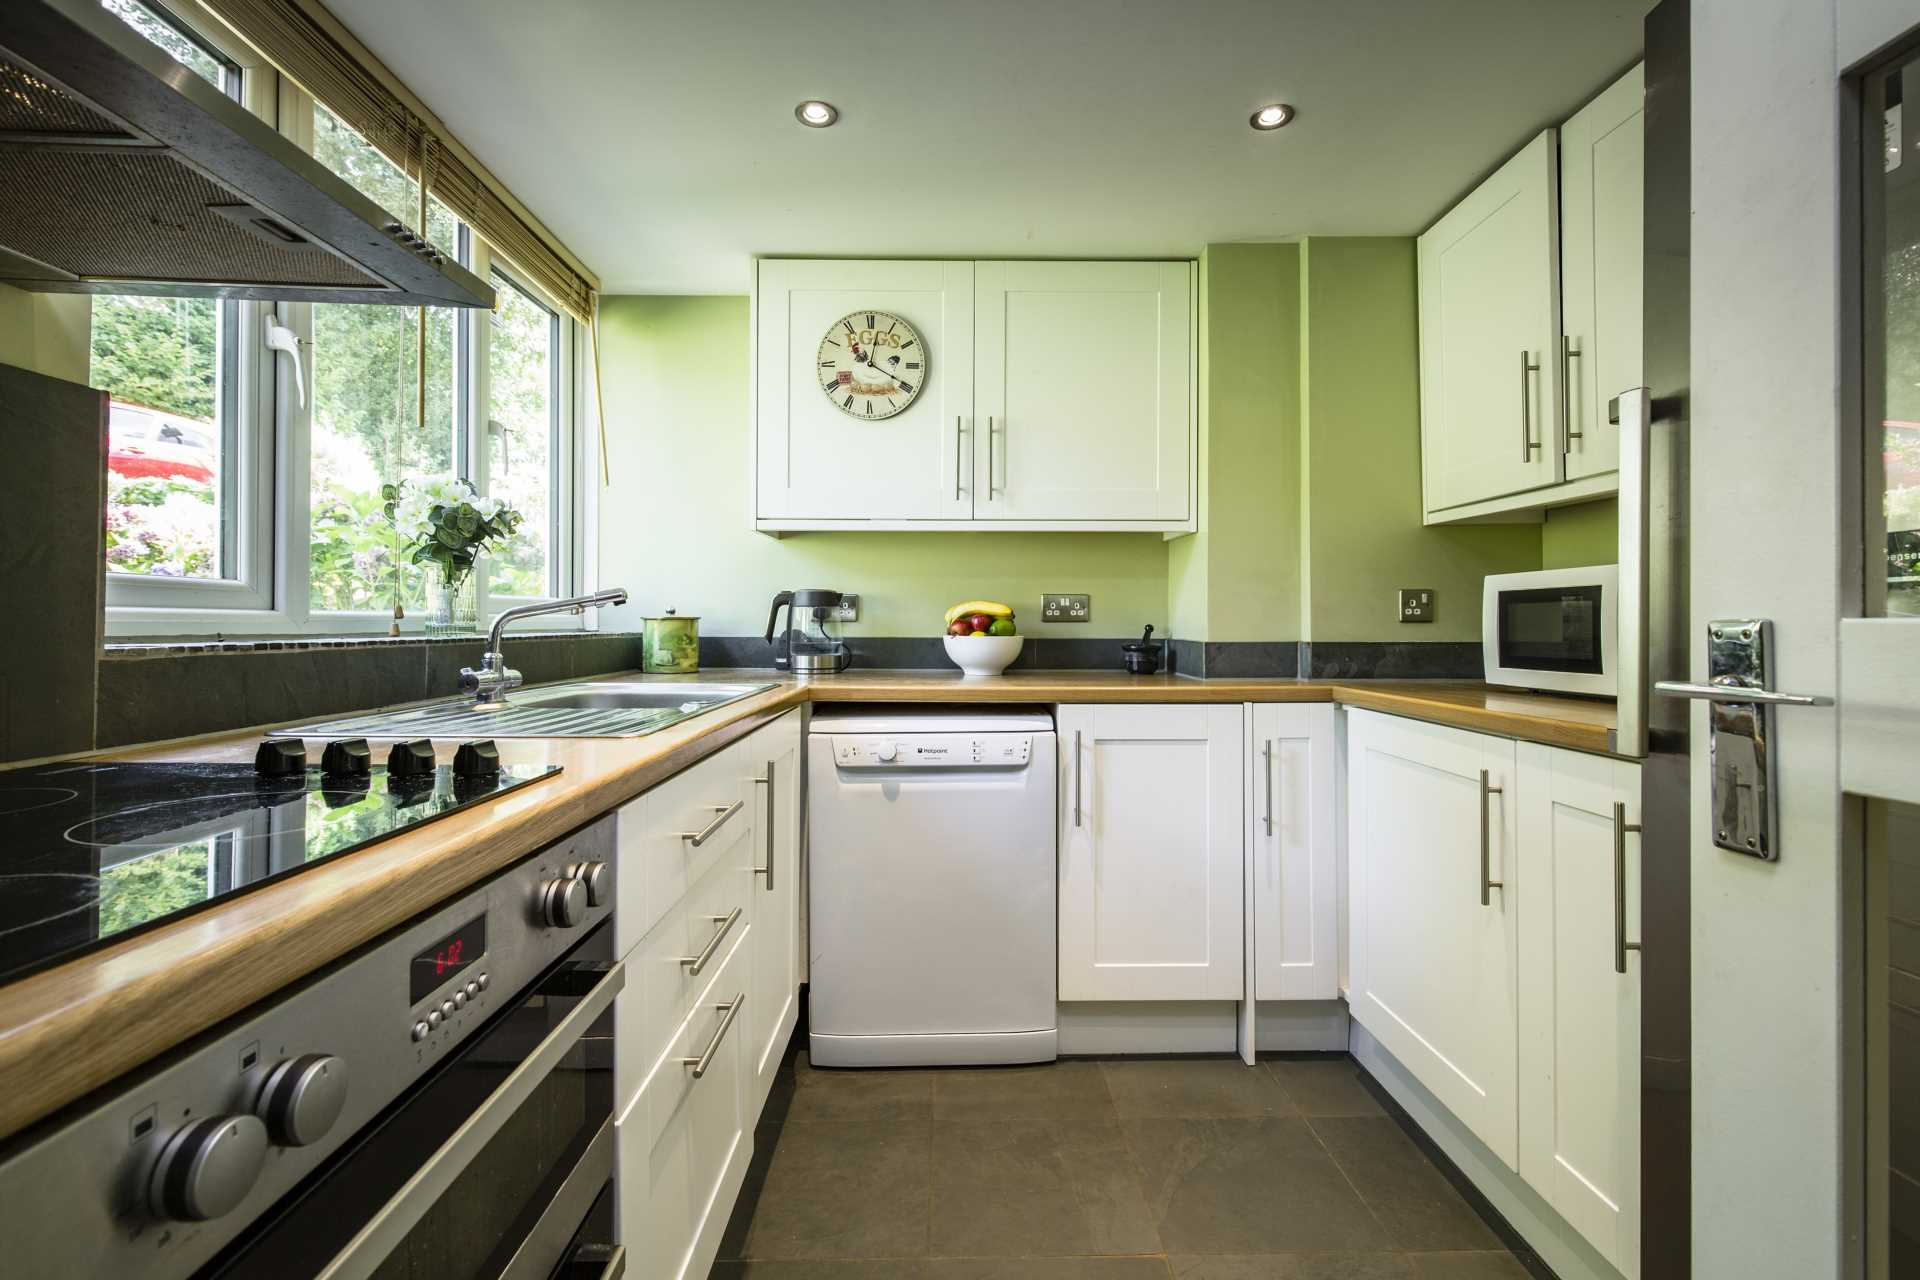 Ashdown Close, Tunbridge Wells, Image 3